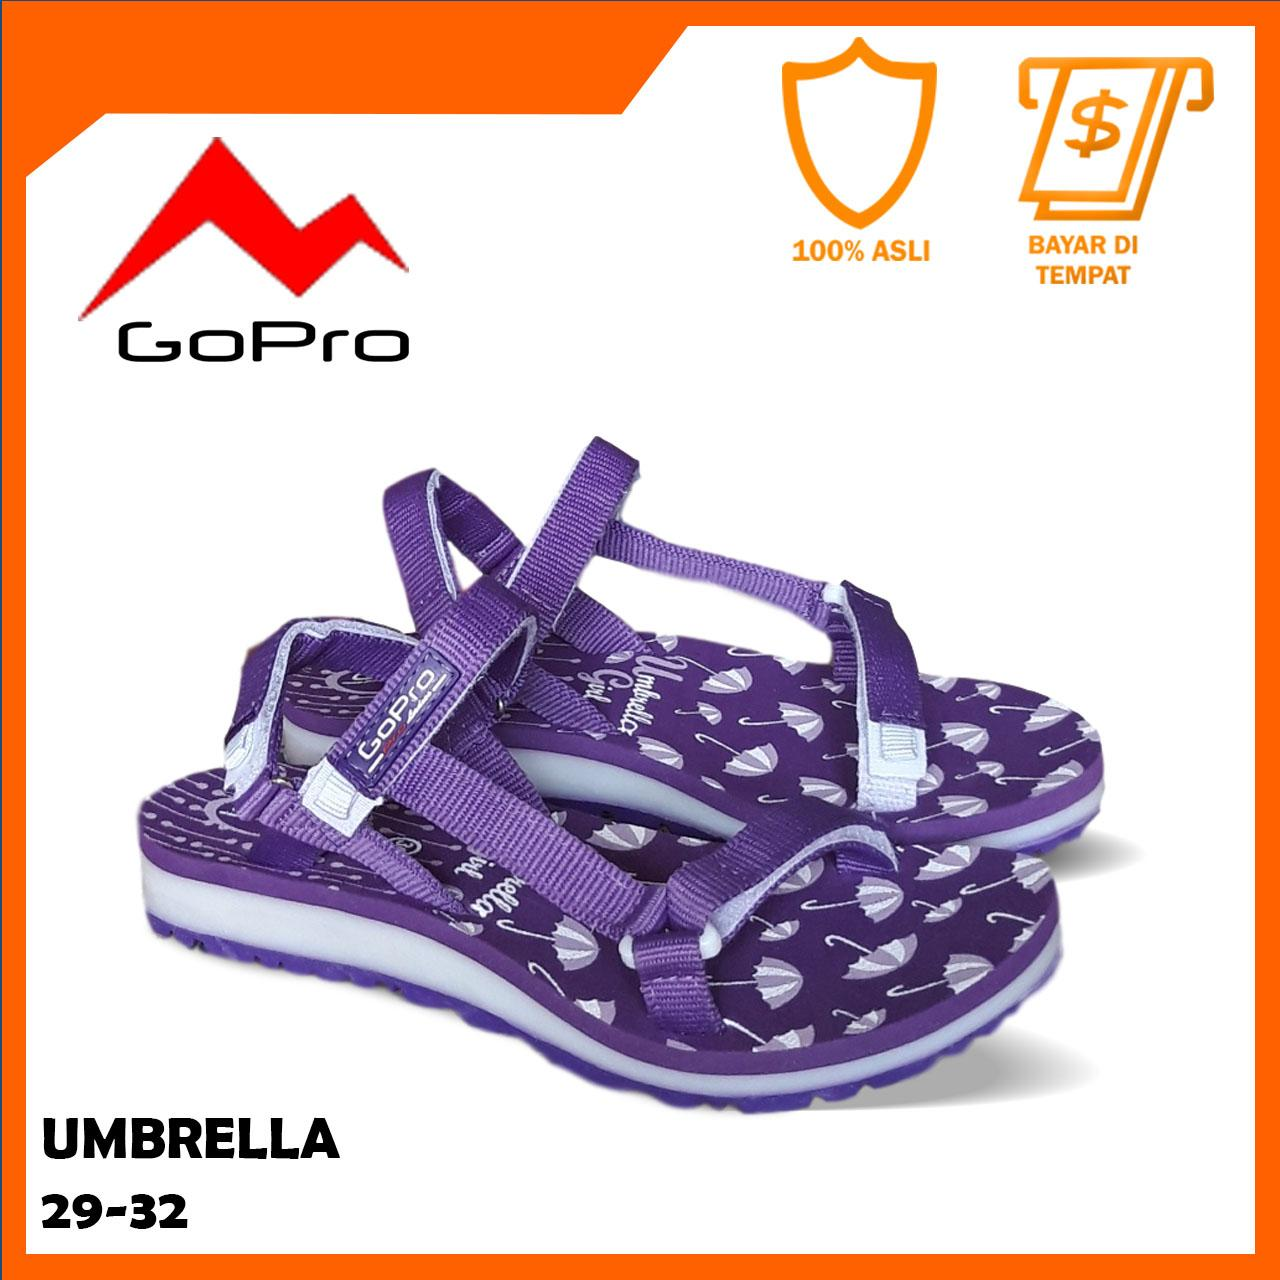 Jual Sepatu Pakaian Olahraga Anak Laki-Laki | Lazada